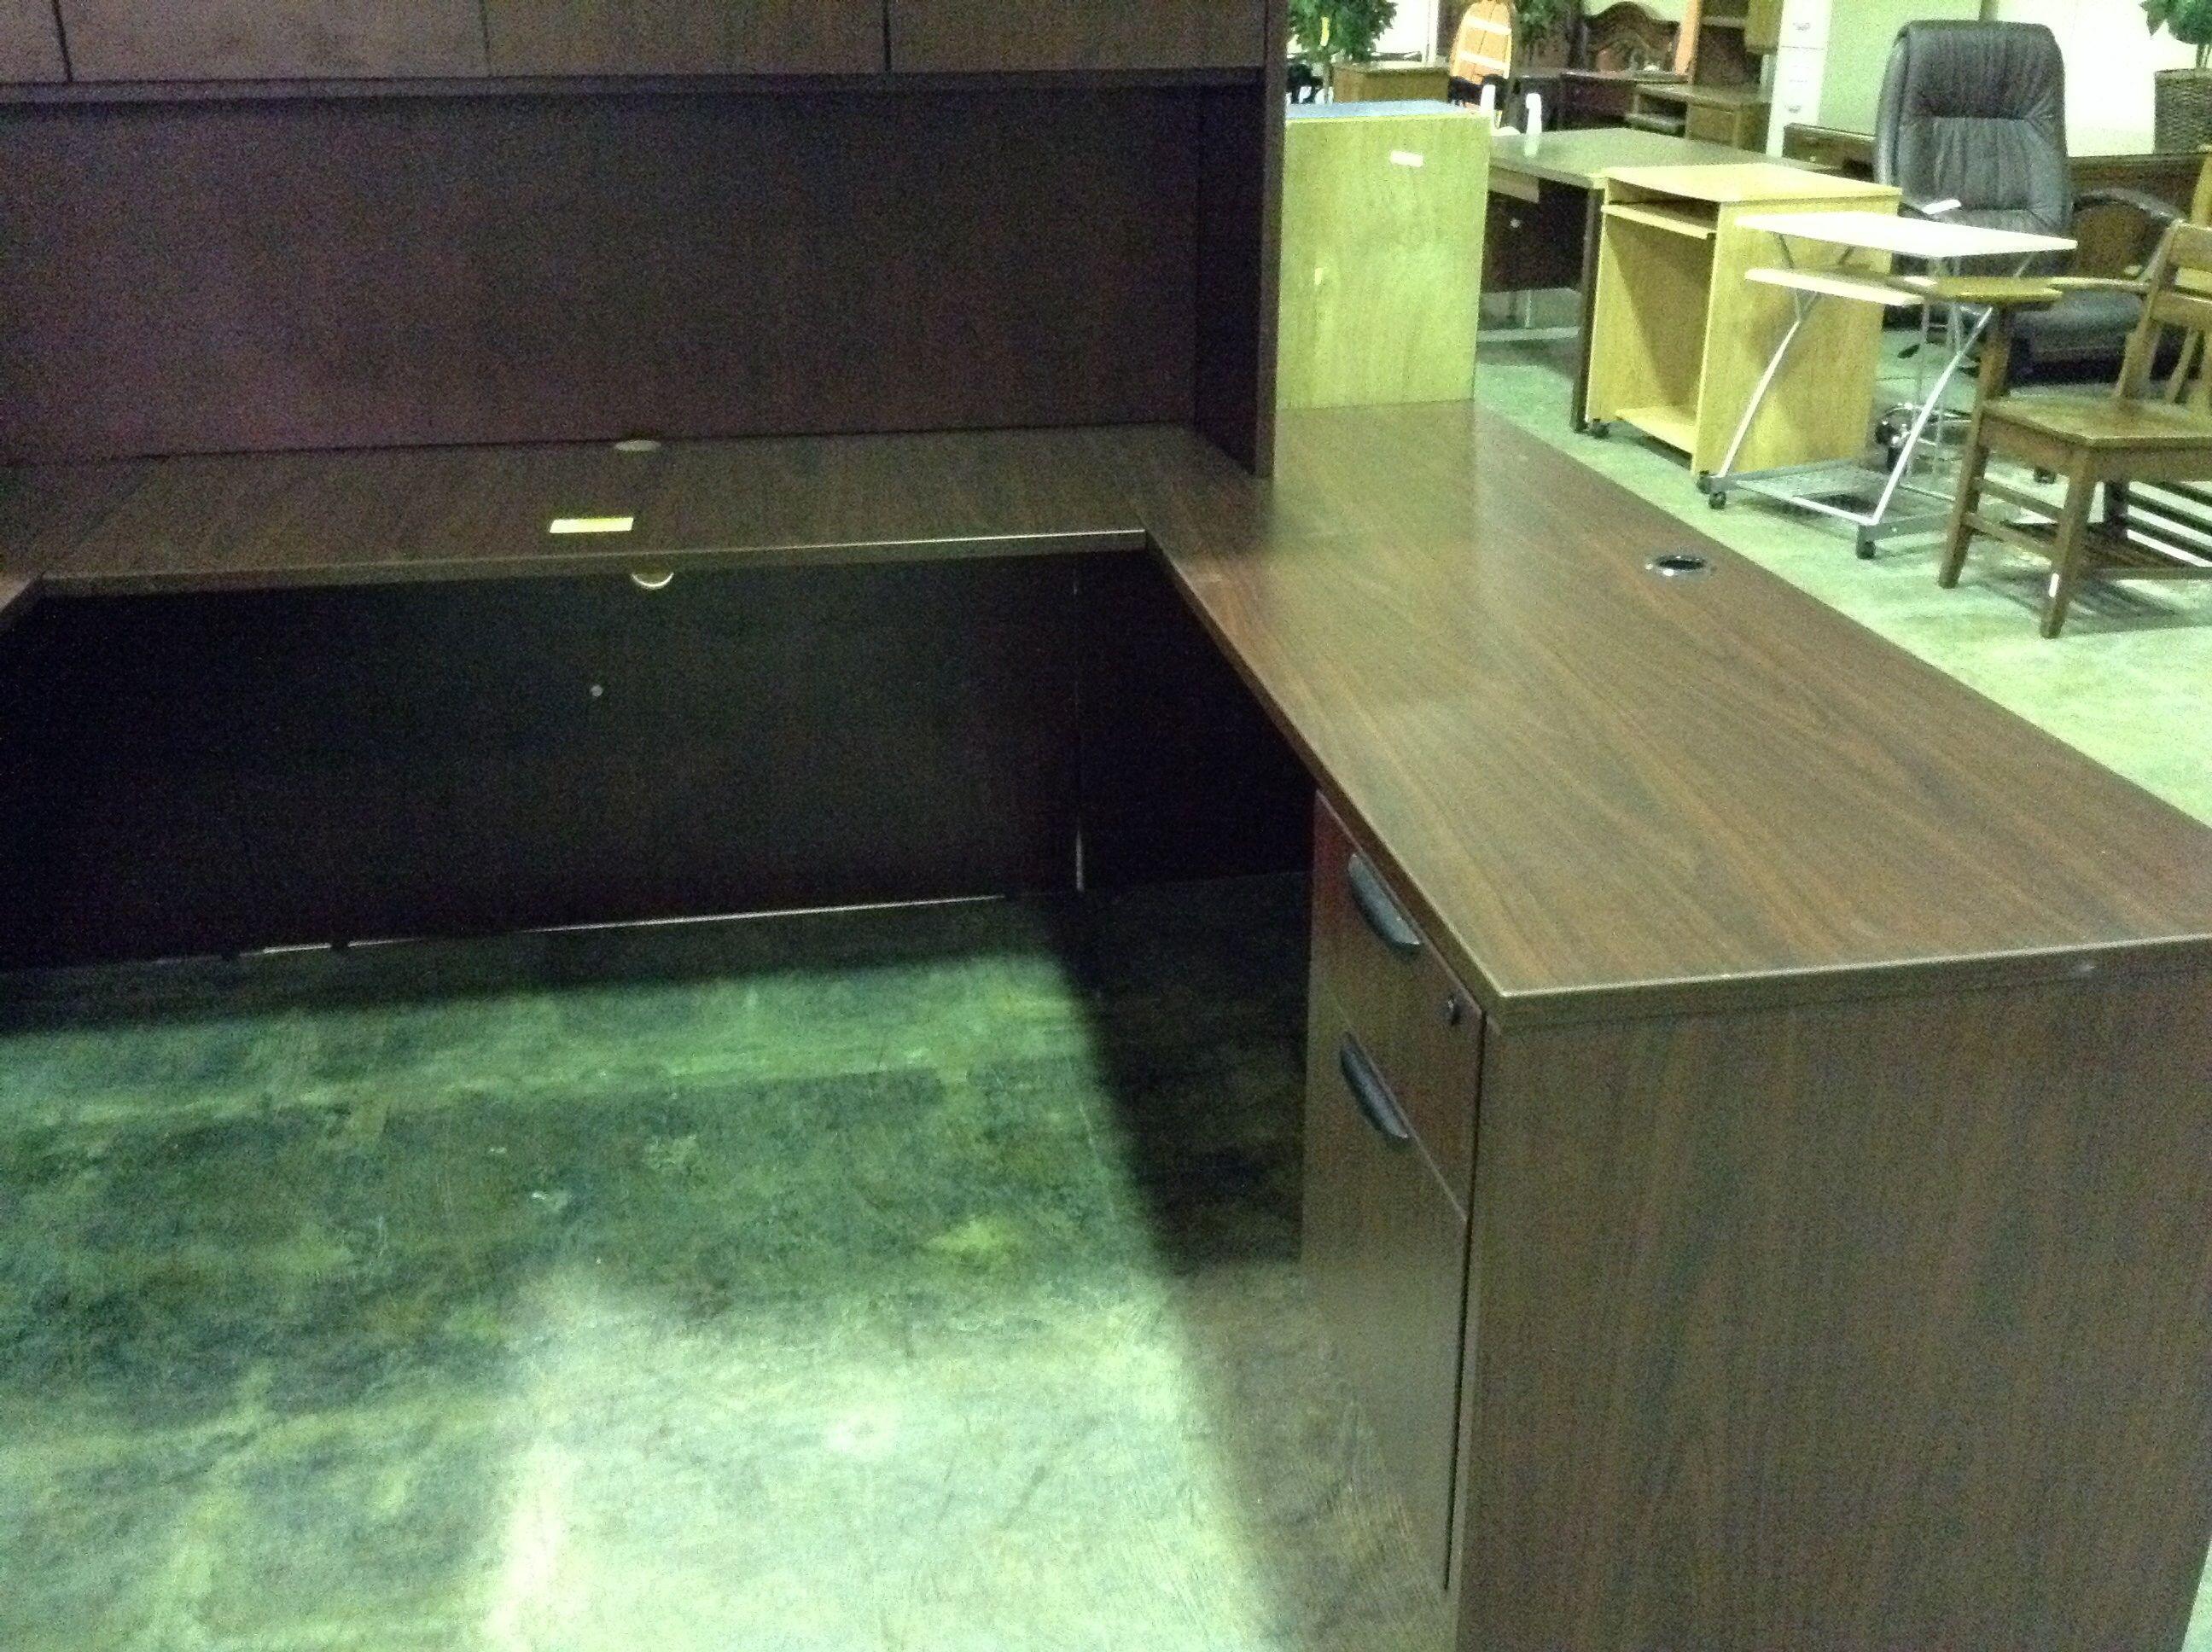 5pc Office Reception Desk With Hutch   $400   Consignment Furniture   Tulsa,  OK